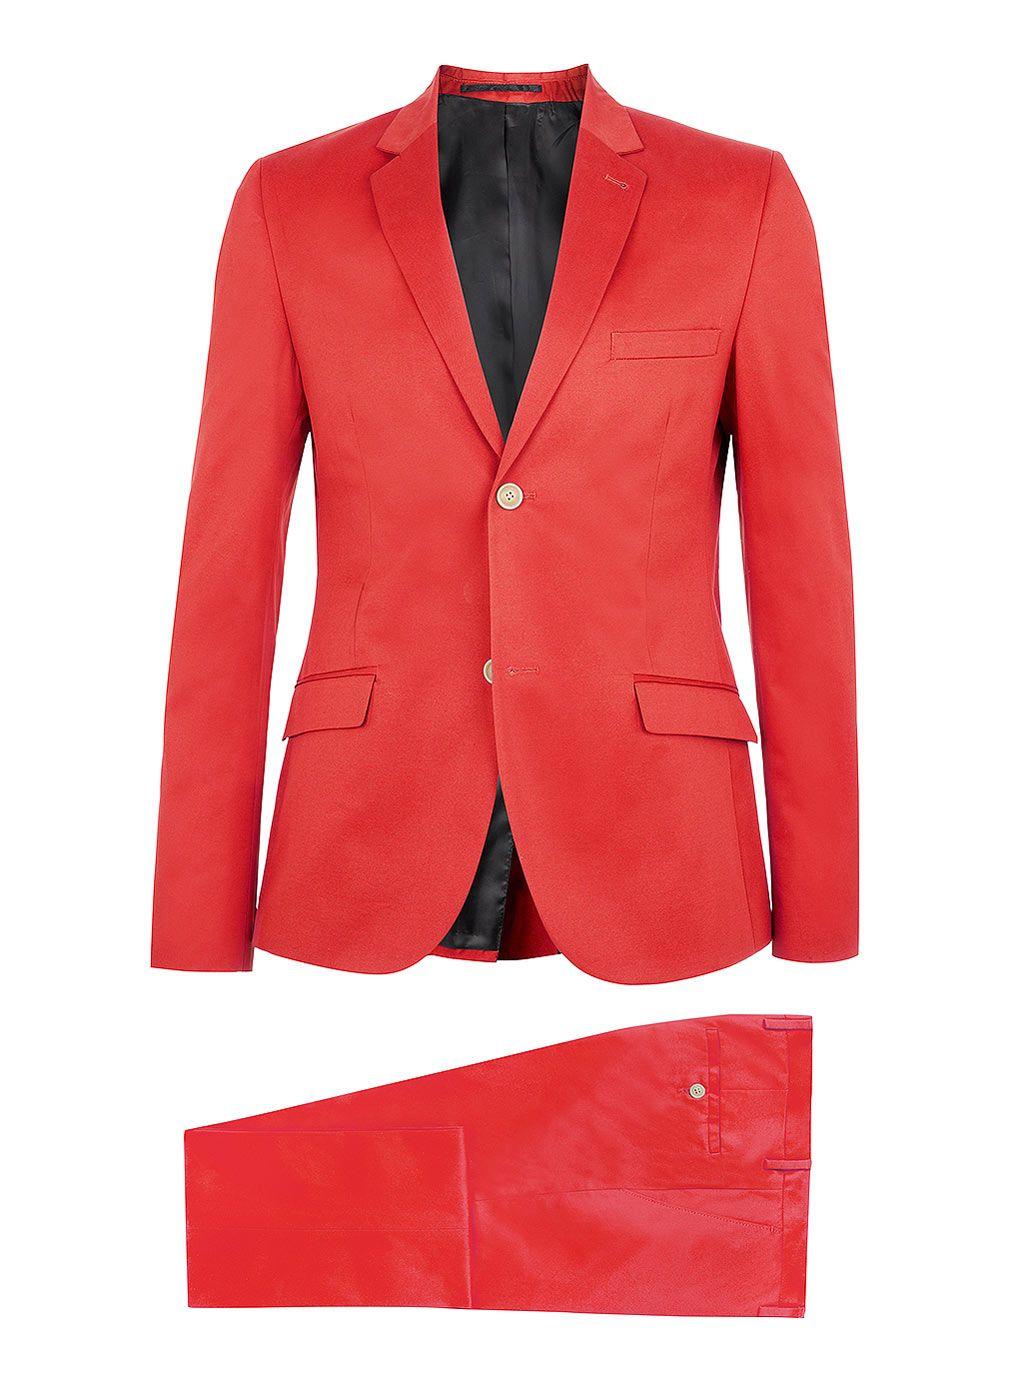 Red Cotton Skinny Suit Mens Suits Suits Topman Usa Mens Hottest Fashion Slim Fit Tuxedo Mens Suits